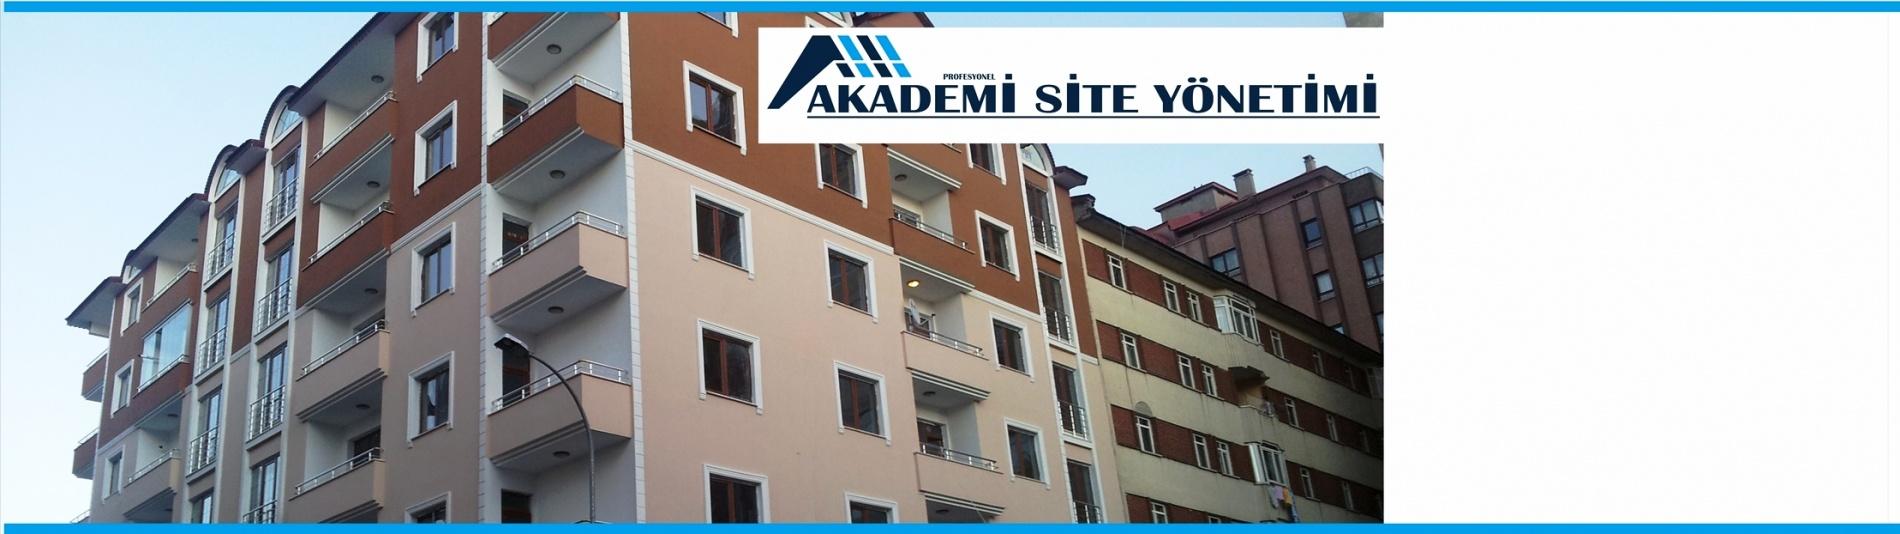 Akademi Profesyonel Site Yonetimi, izmit site yonetim, kocaeli site yonetim, İletisim